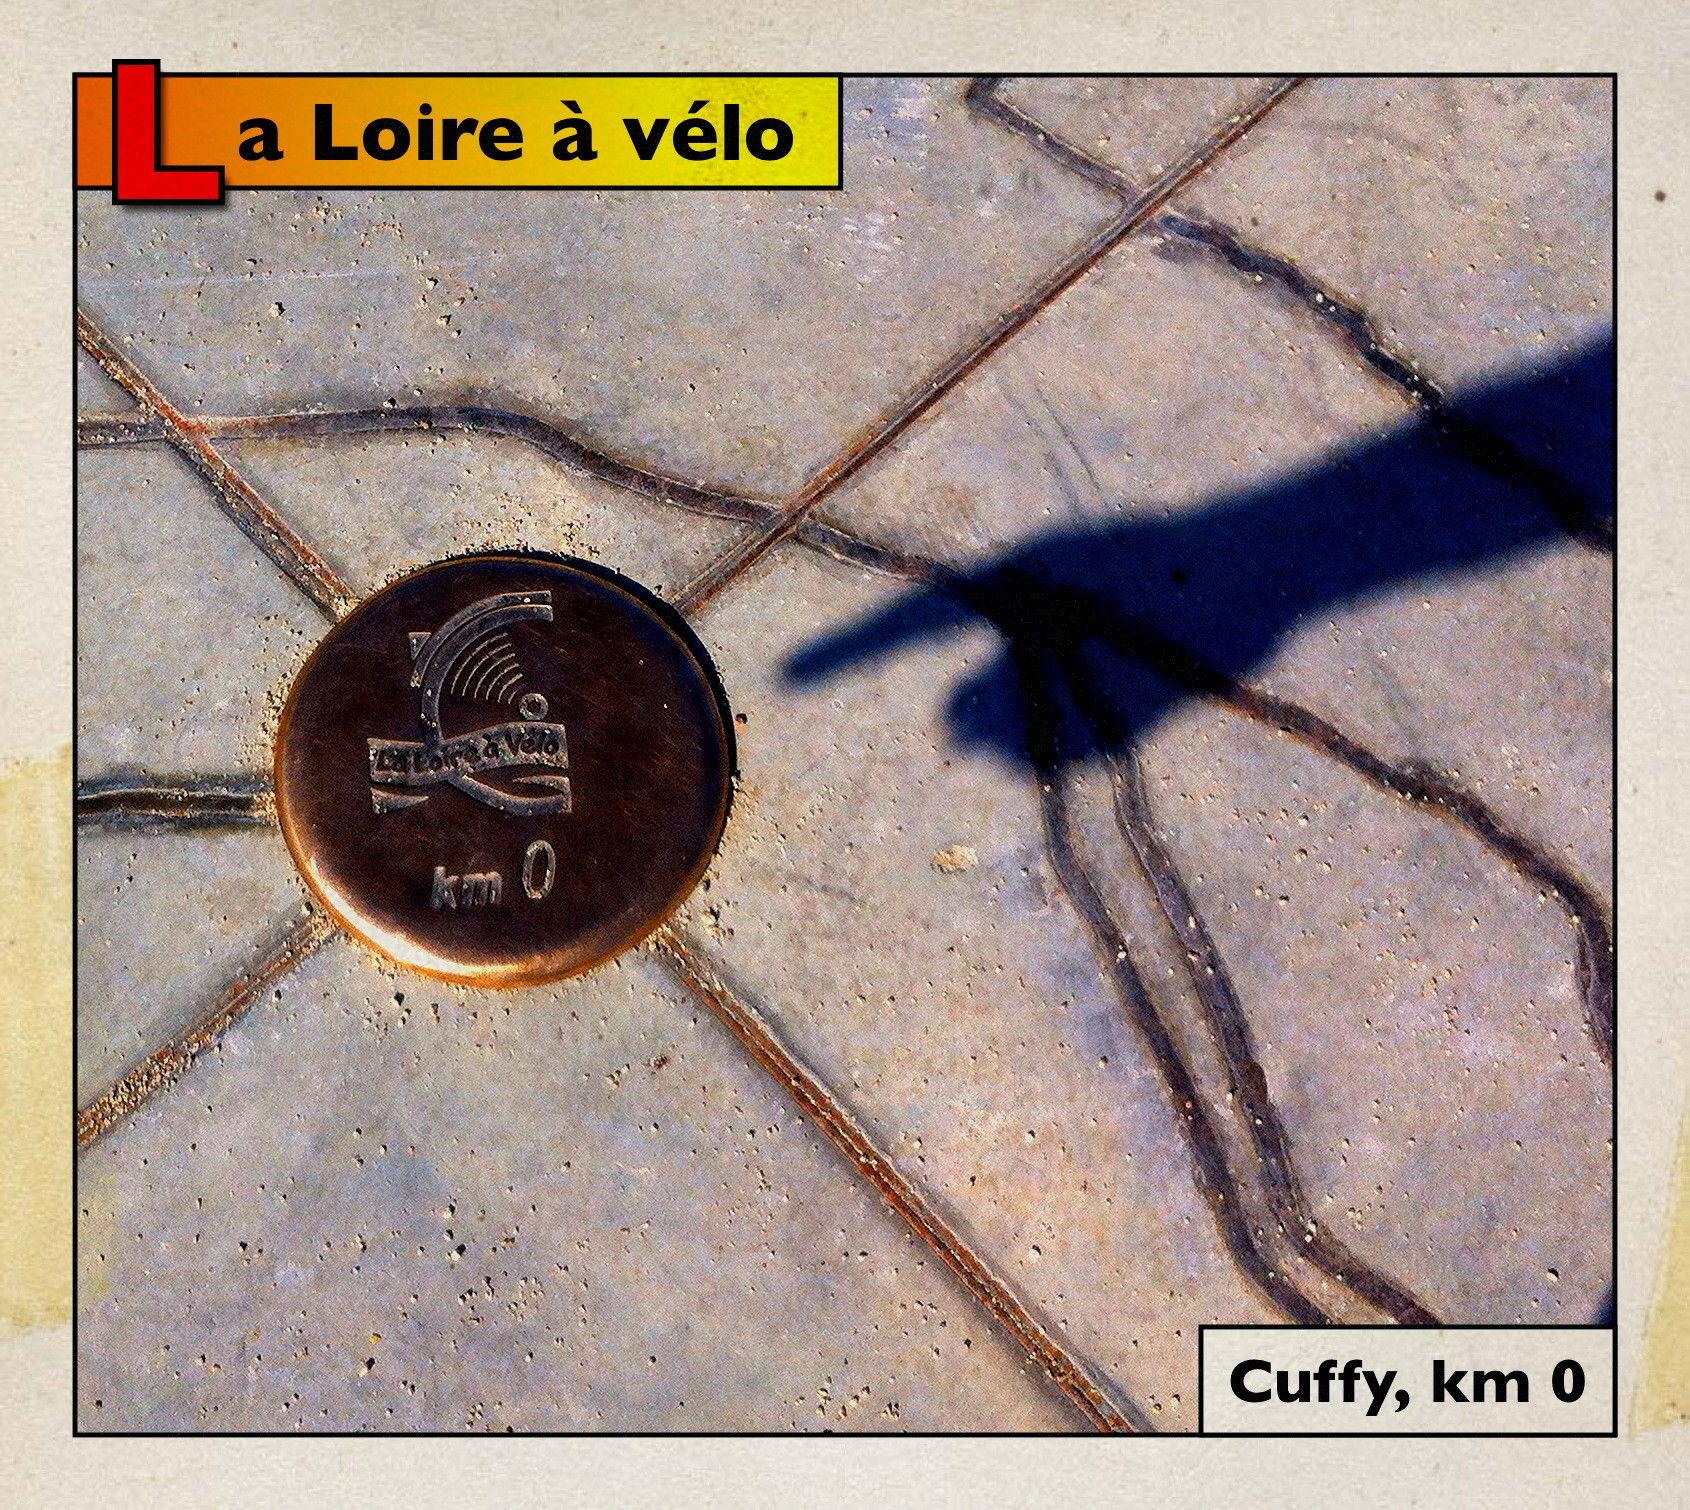 Cuffy, km0 de La Loire à vélo (18)